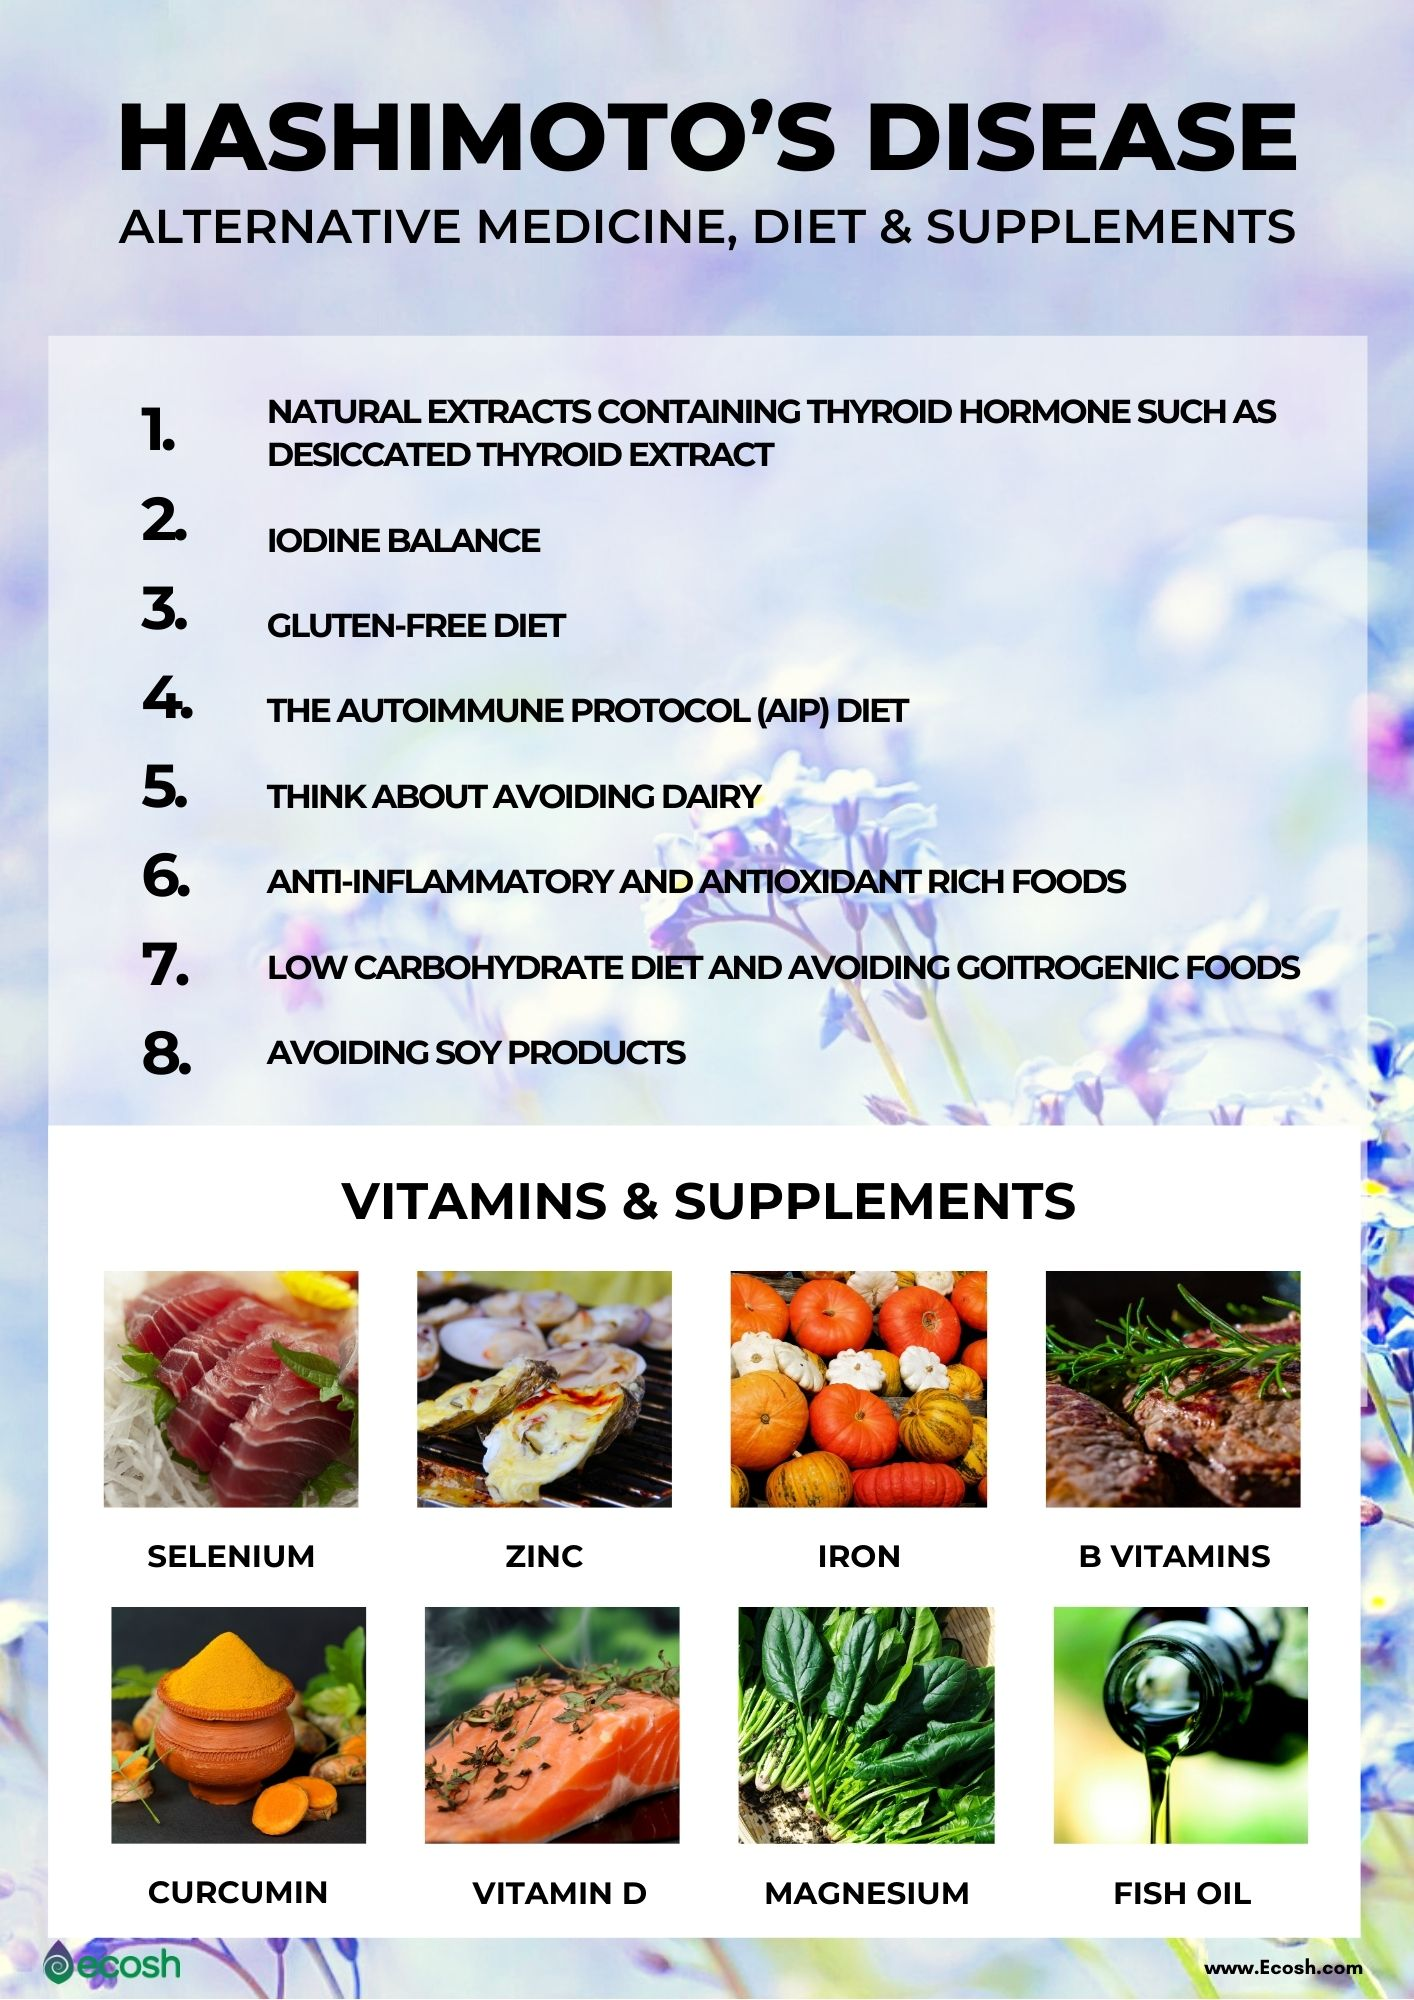 Hashimoto's_ disease_treatment_Hashimoto's_disease_Diet_Supplements_for_Hashimoto's_disease_Hashimoto's_thyroiditis_Natural_Treatment_Hashimoto's_thyroiditis_Diet_Supplements_for_Hashimoto's_